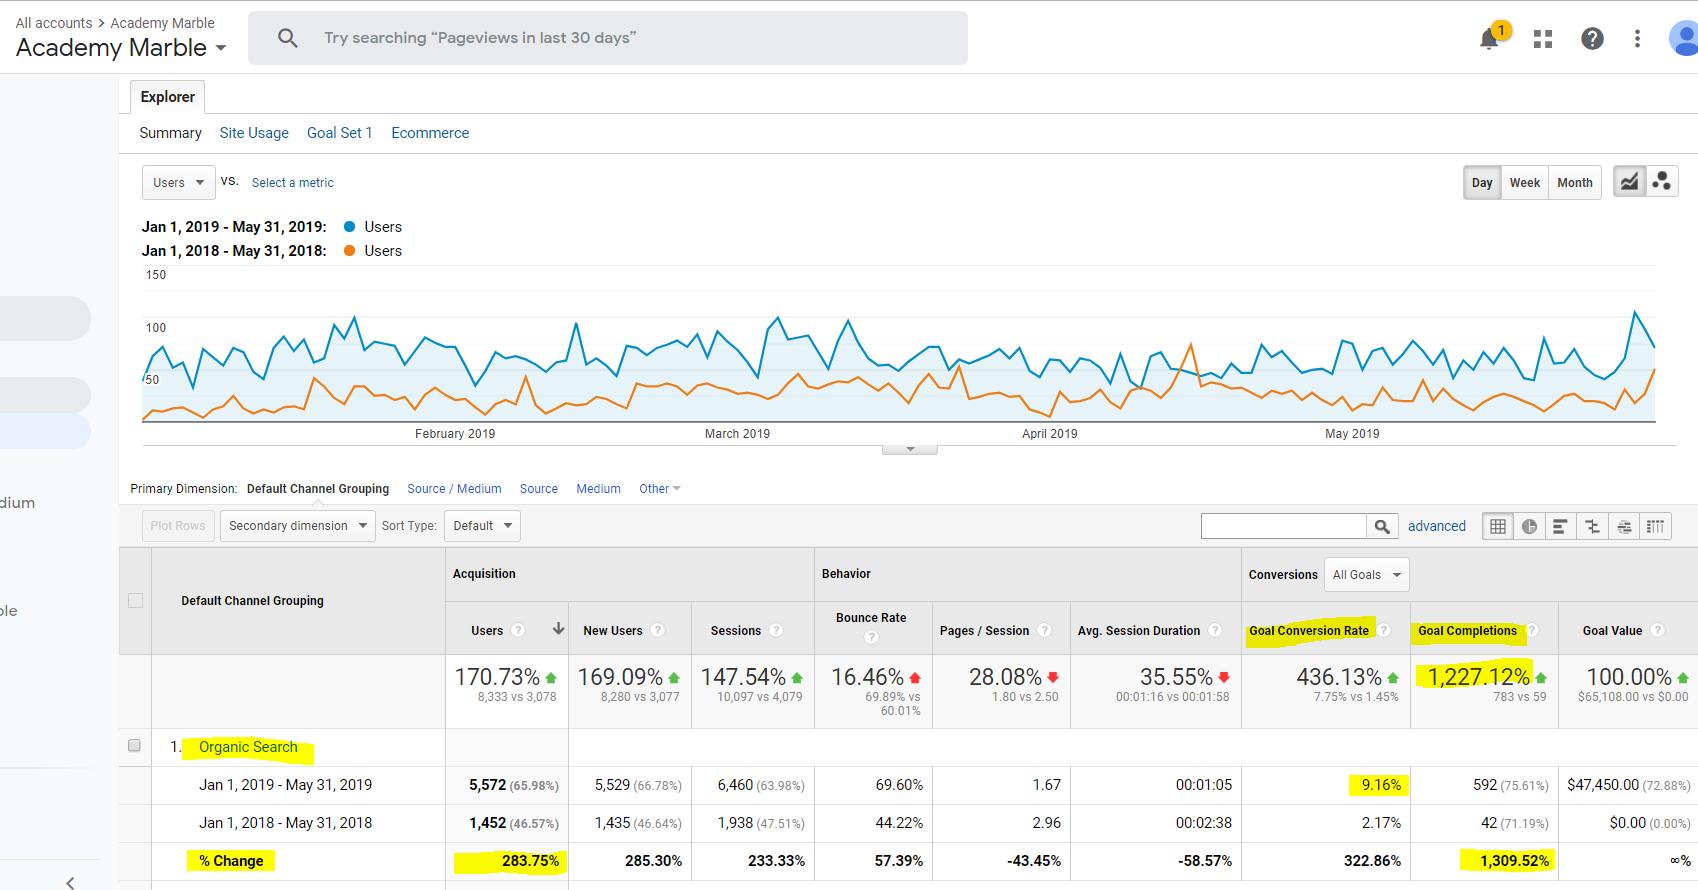 Organic Search Traffic Increase YOY